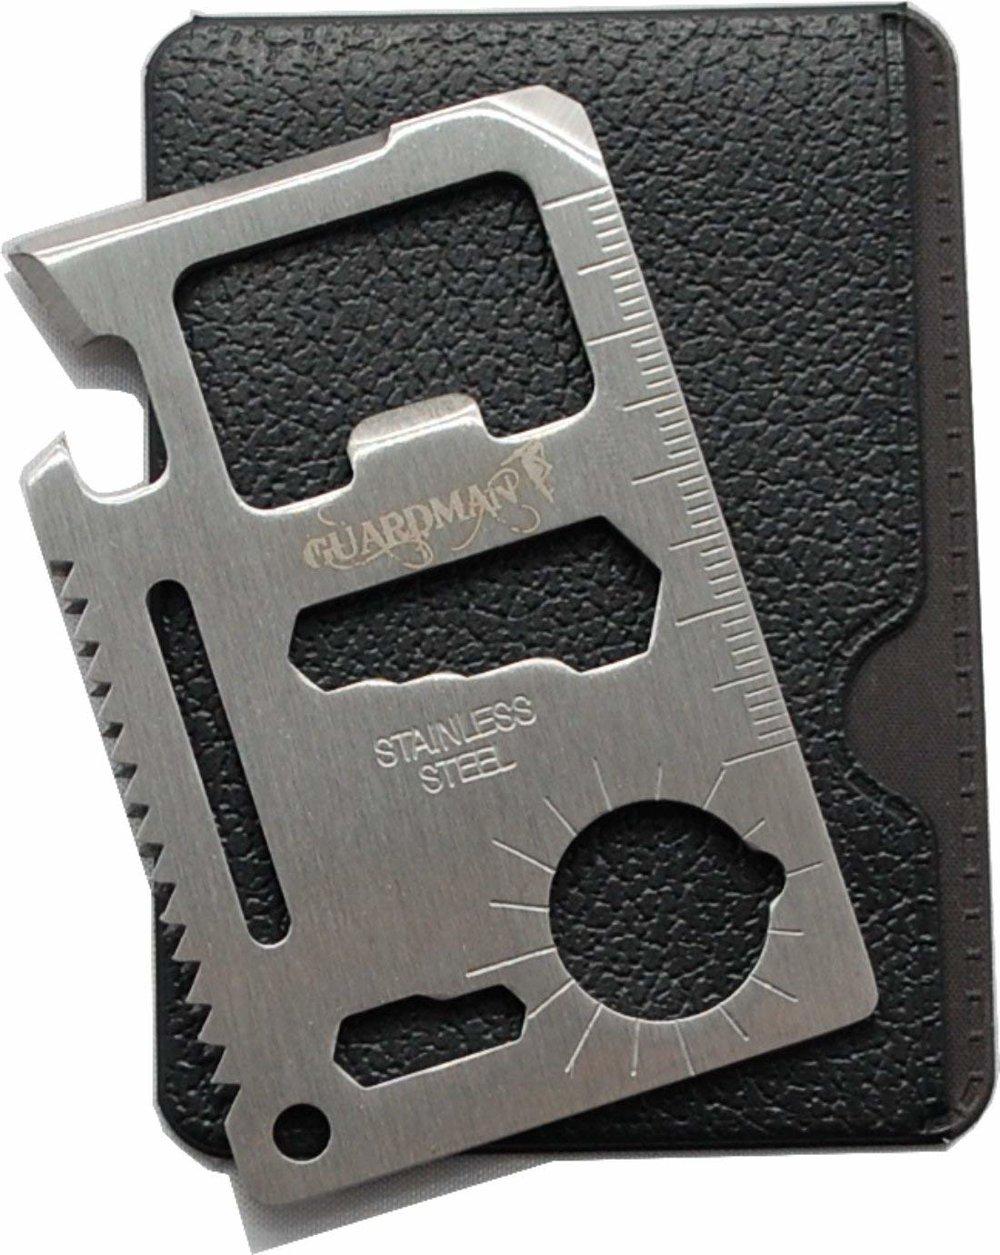 guradman 11-in-1 tool.jpg